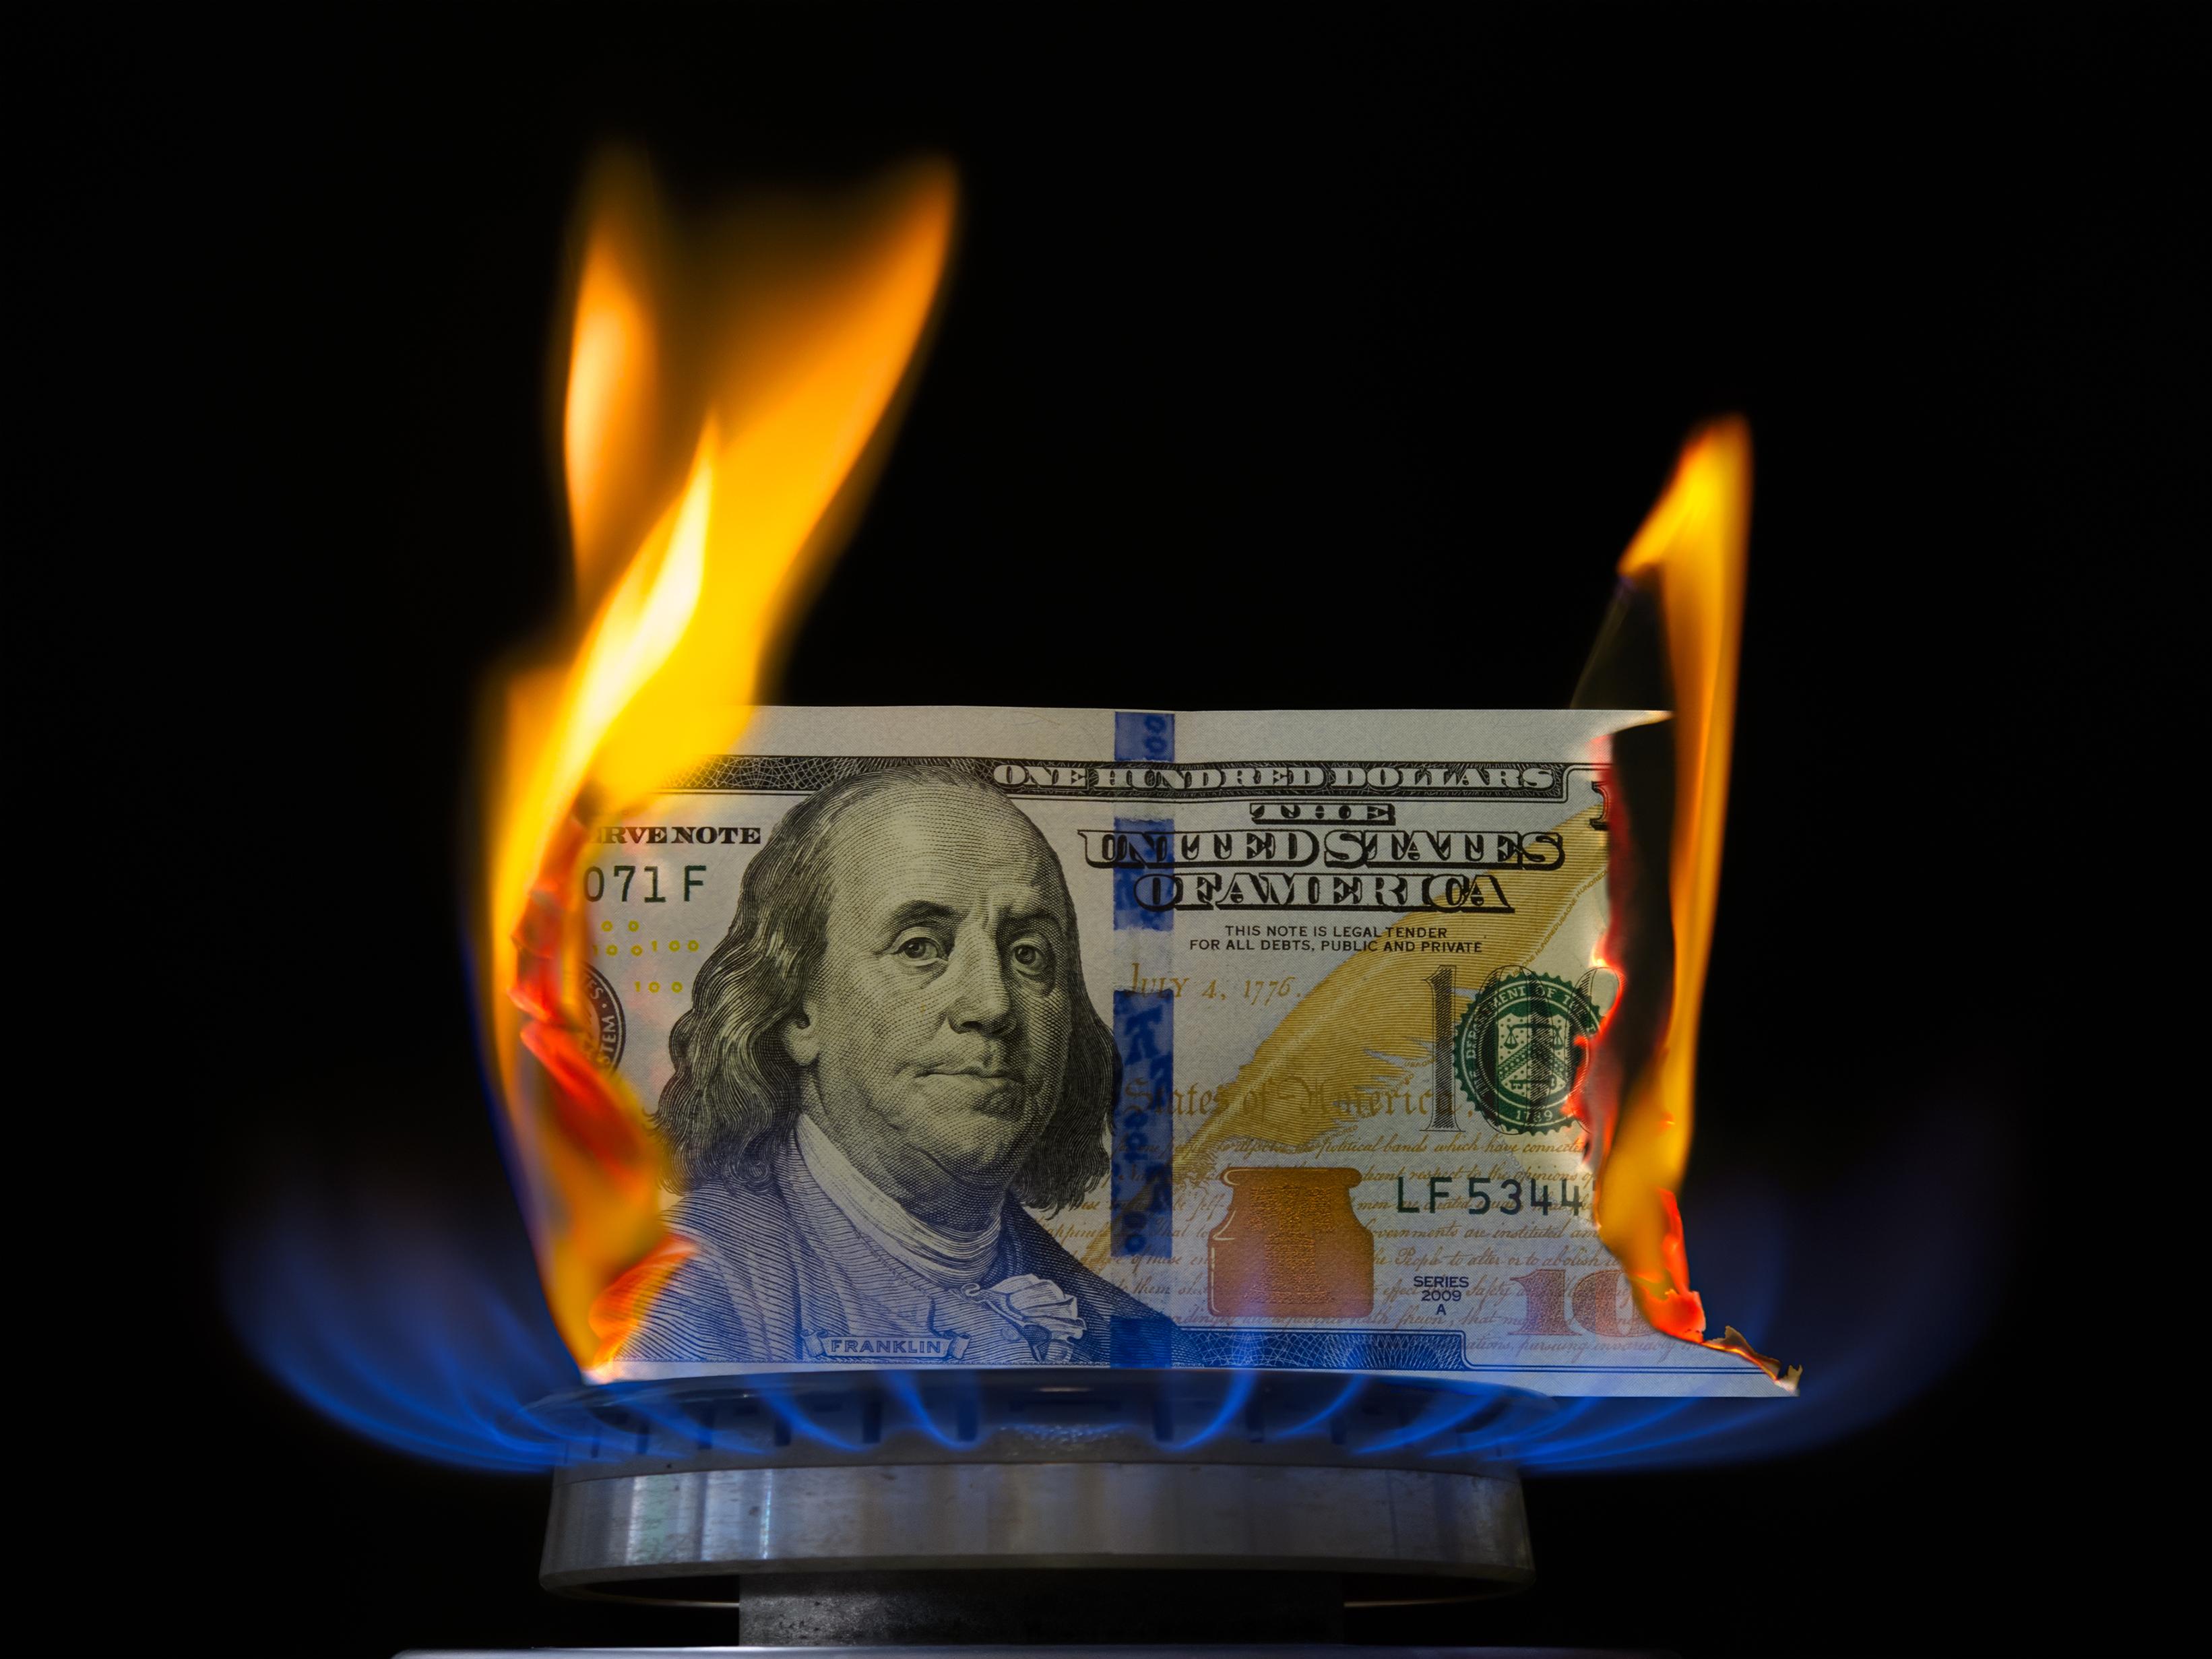 A hundred dollar bill on fire on a stove burner.